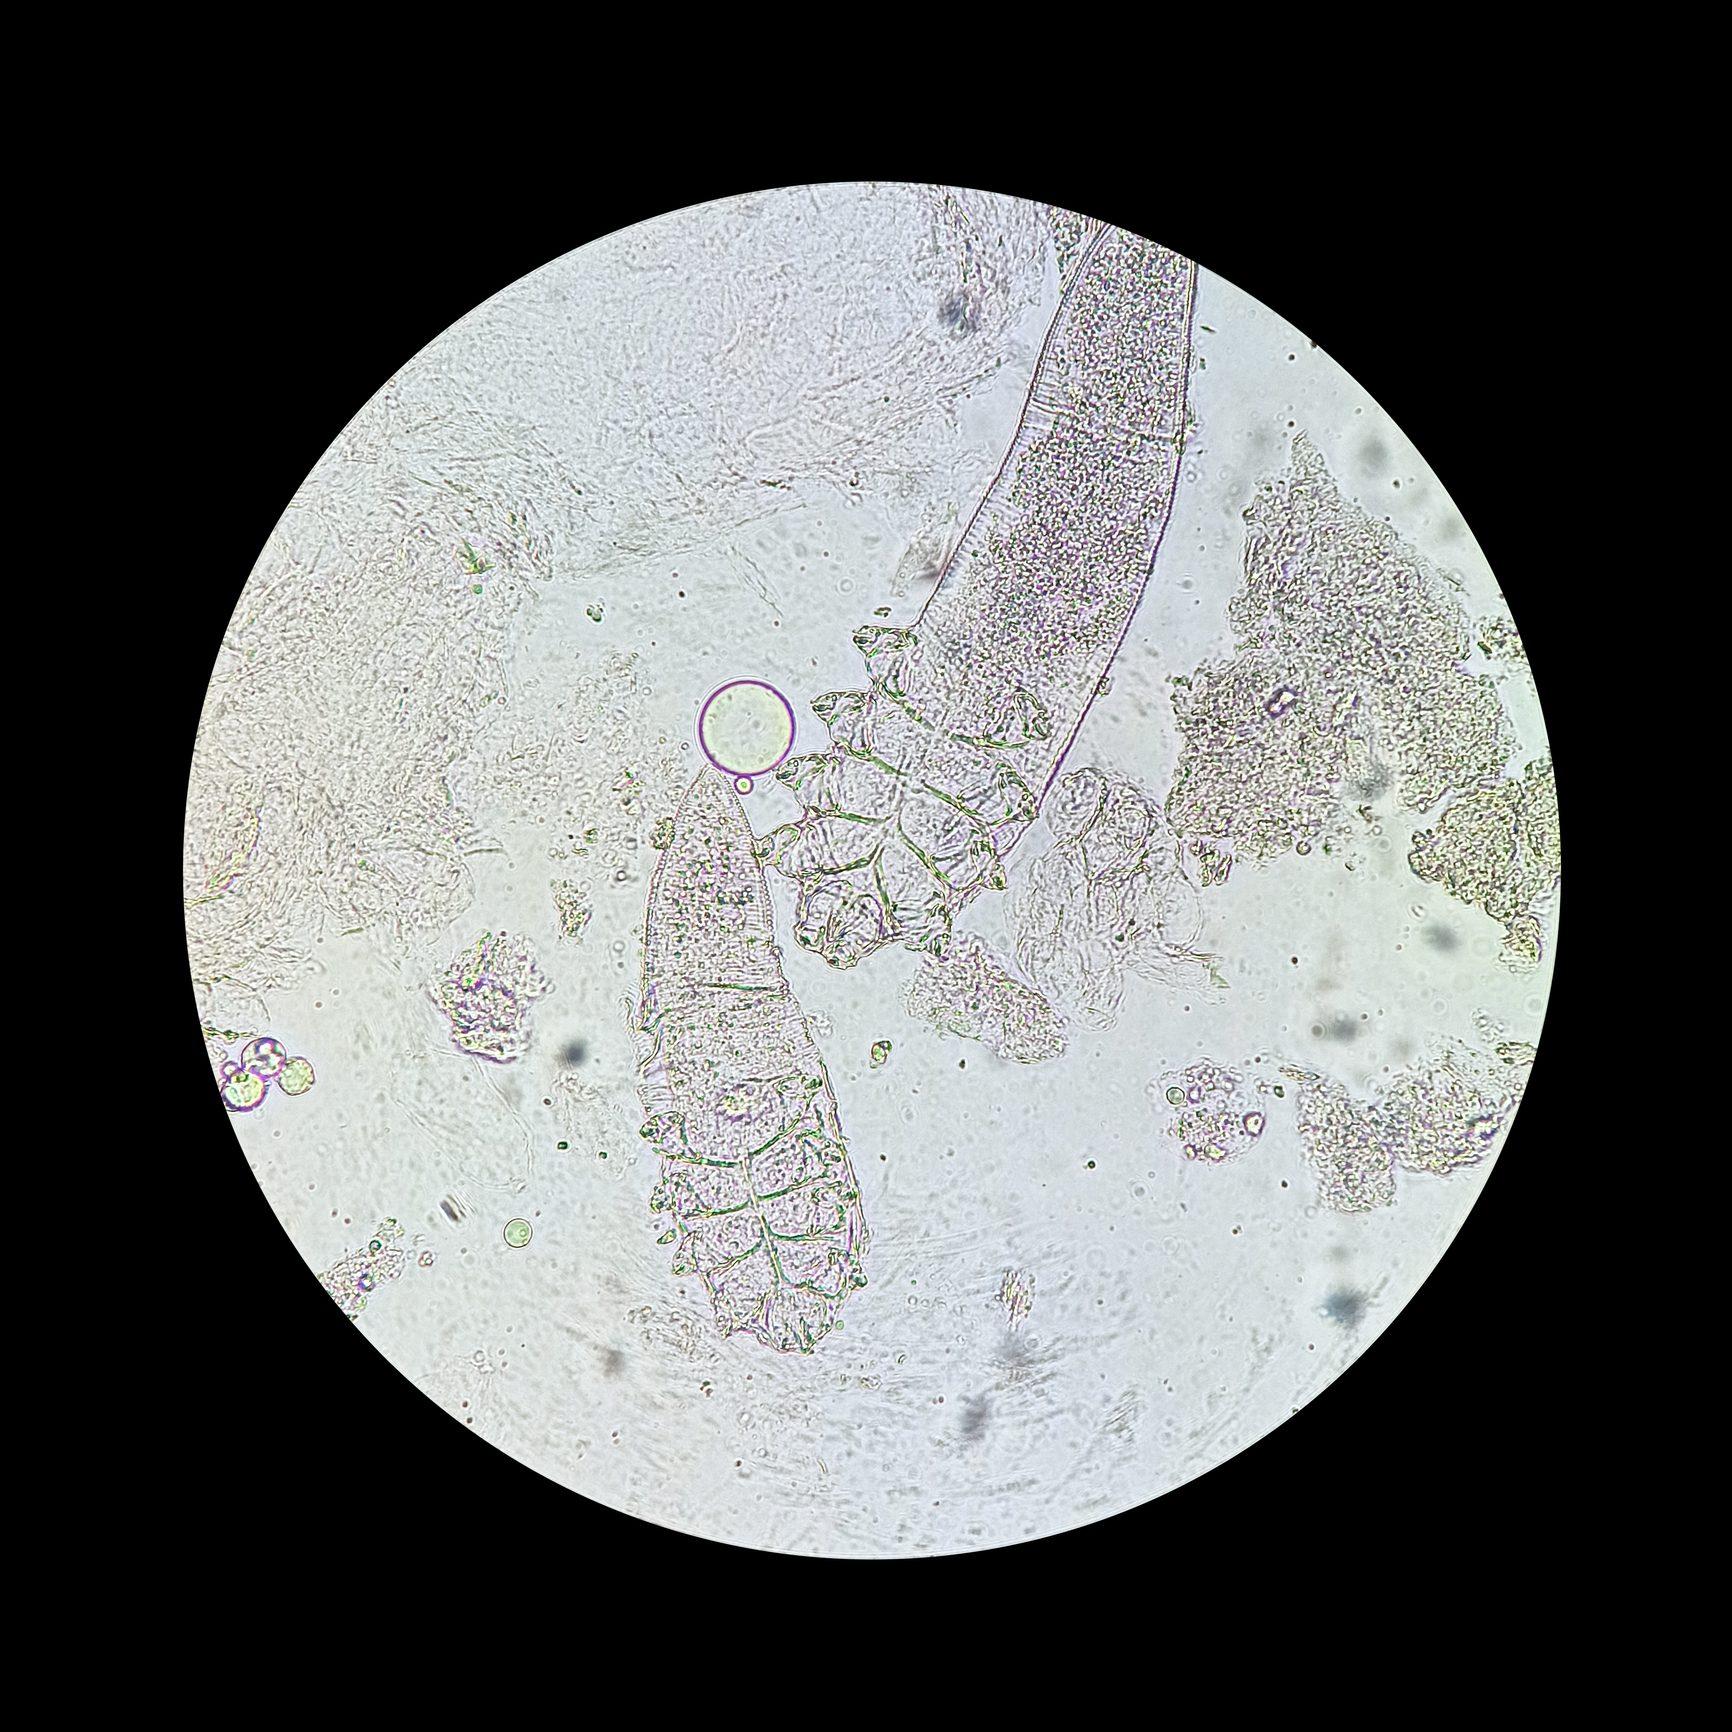 demodex mites under microscope